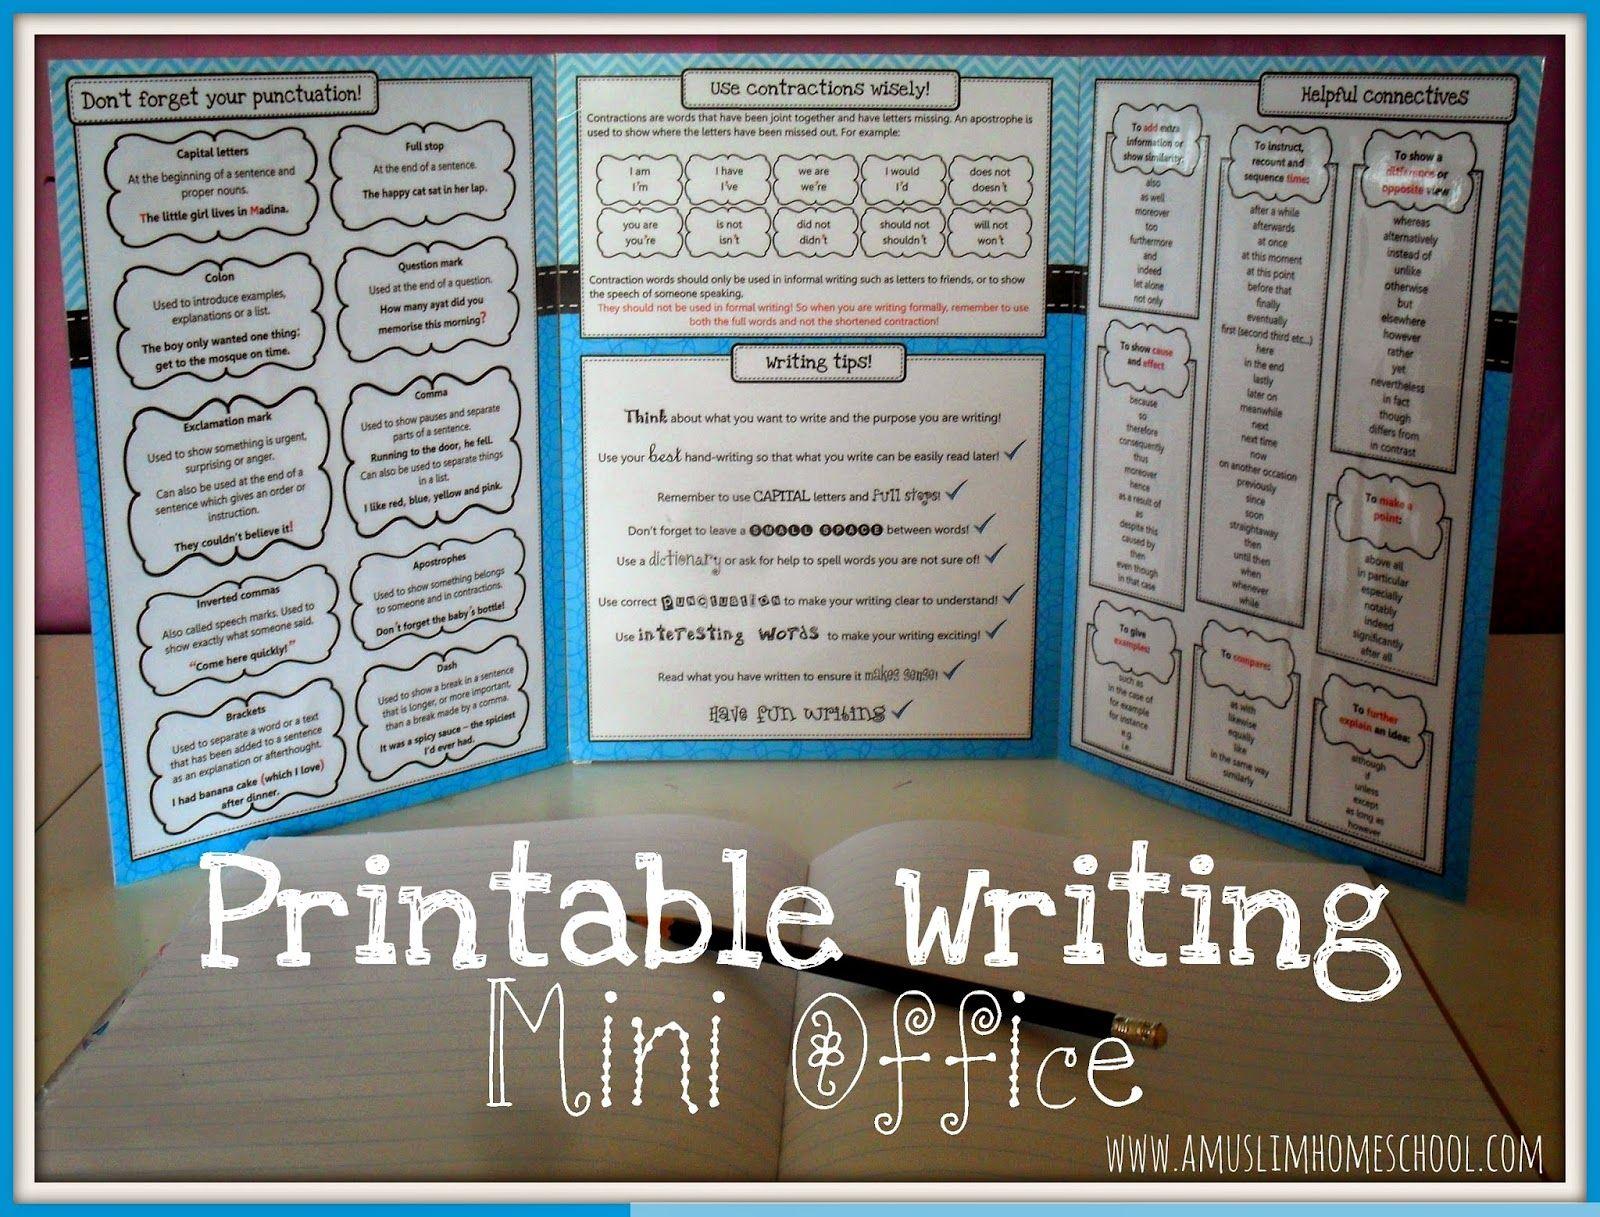 Incroyable A Muslim Homeschool: Writing Mini Office